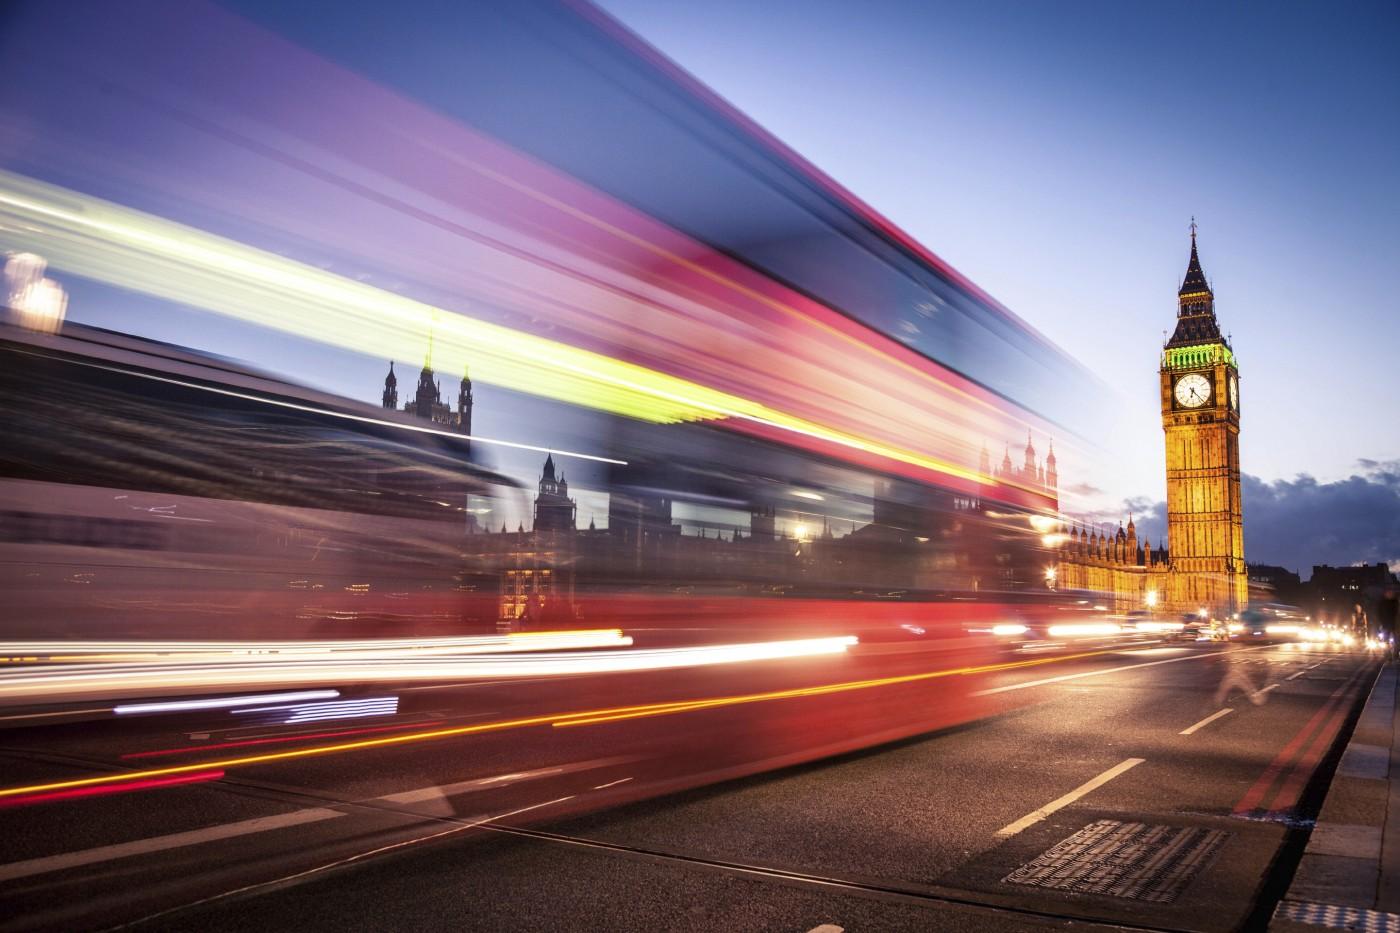 london-red-bus-on-westminster-bridge